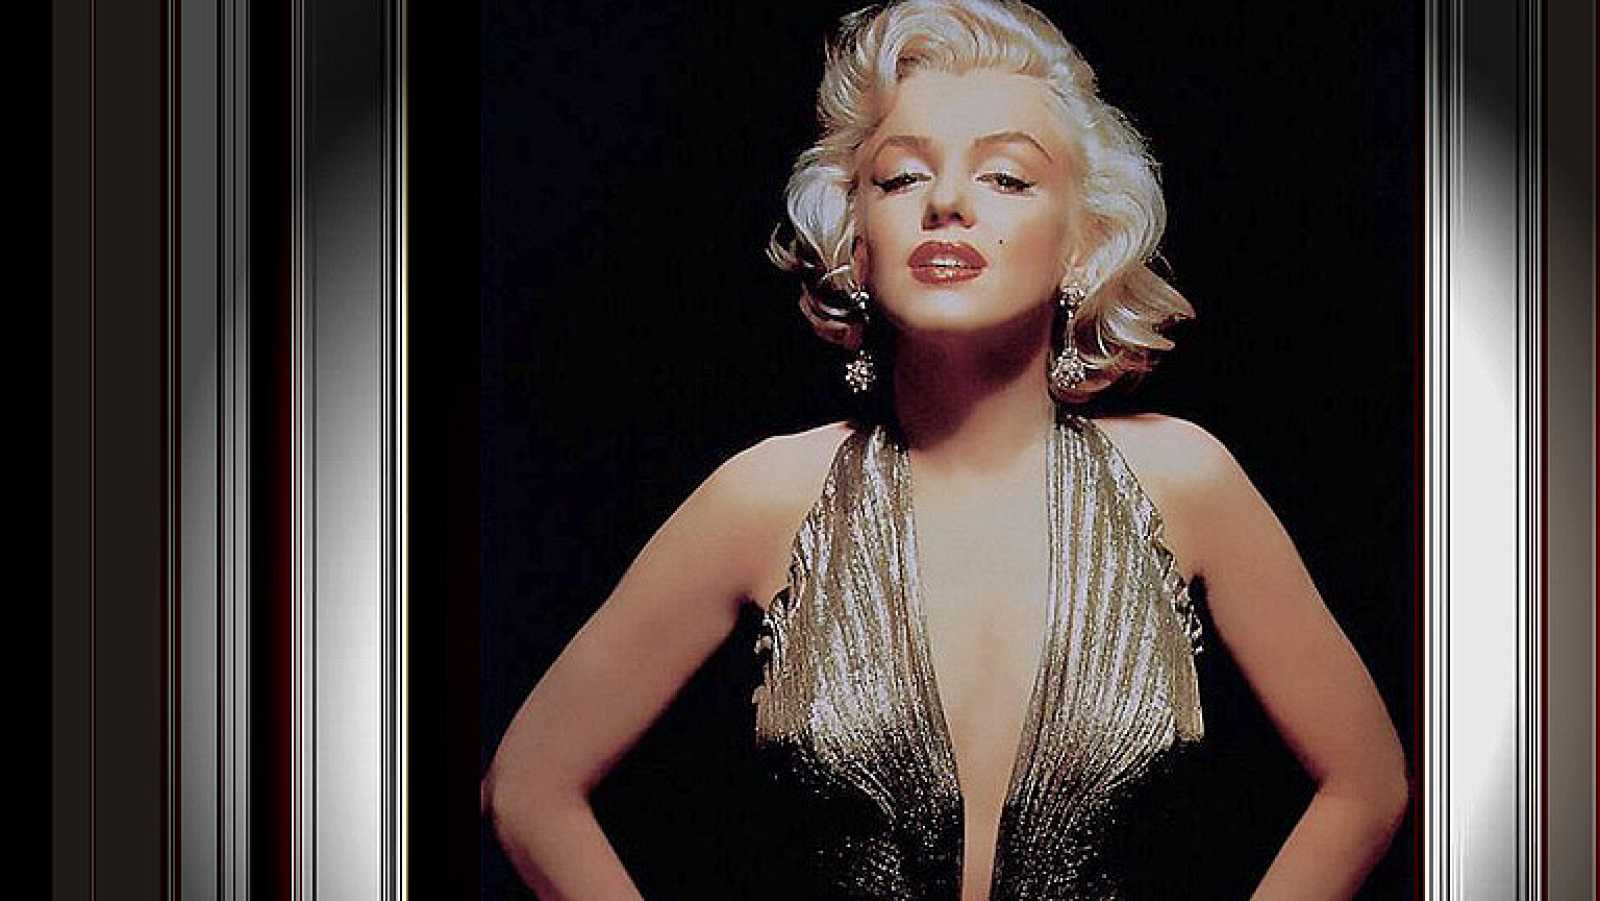 50 años sin Marilyn Monroe